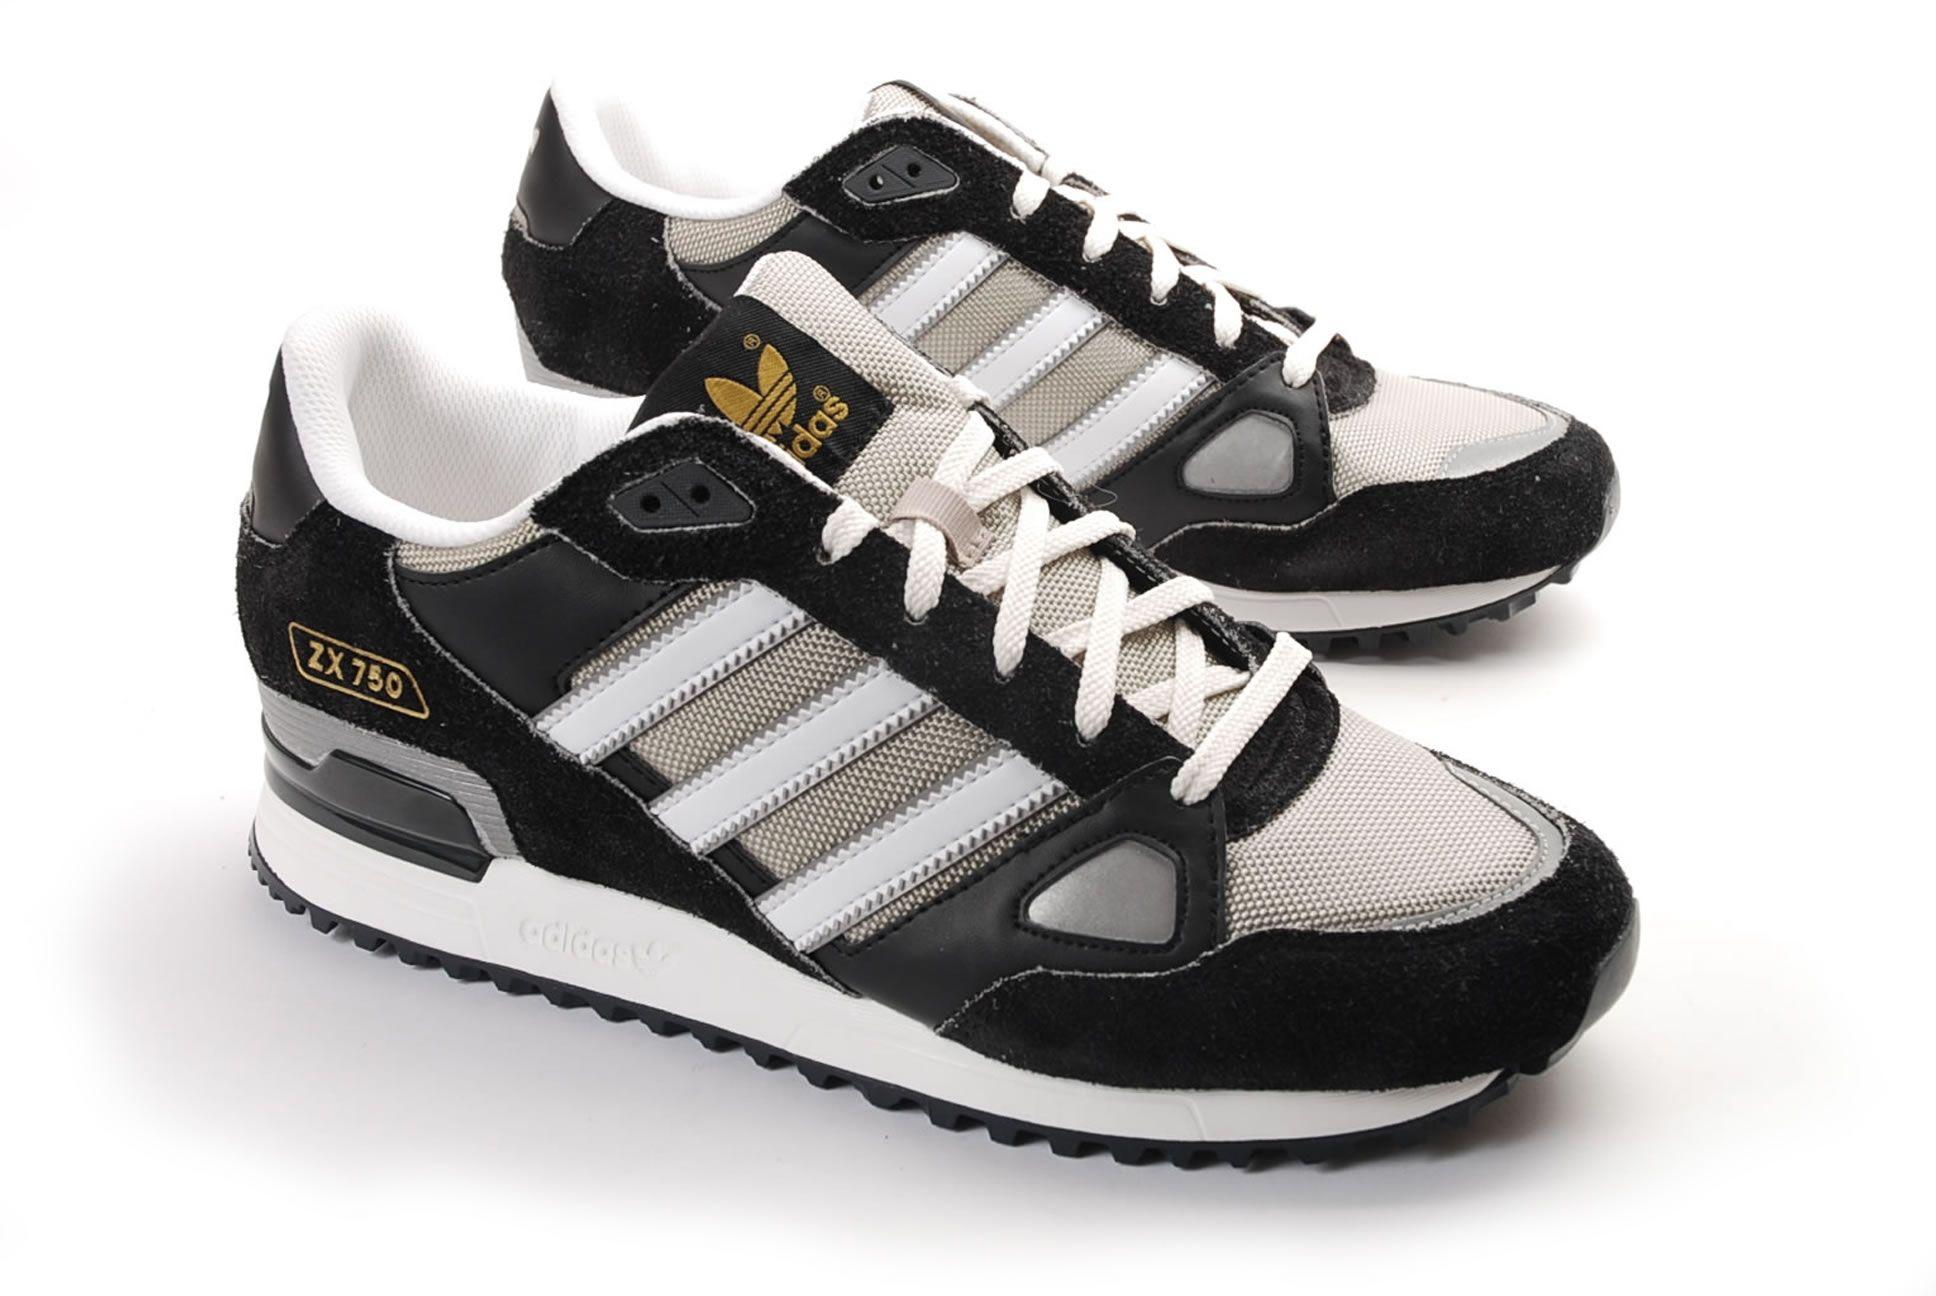 acheter populaire b9744 a8057 Adidas Zx 750 Noir | ...on my feet... | Adidas, Adidas zx ...